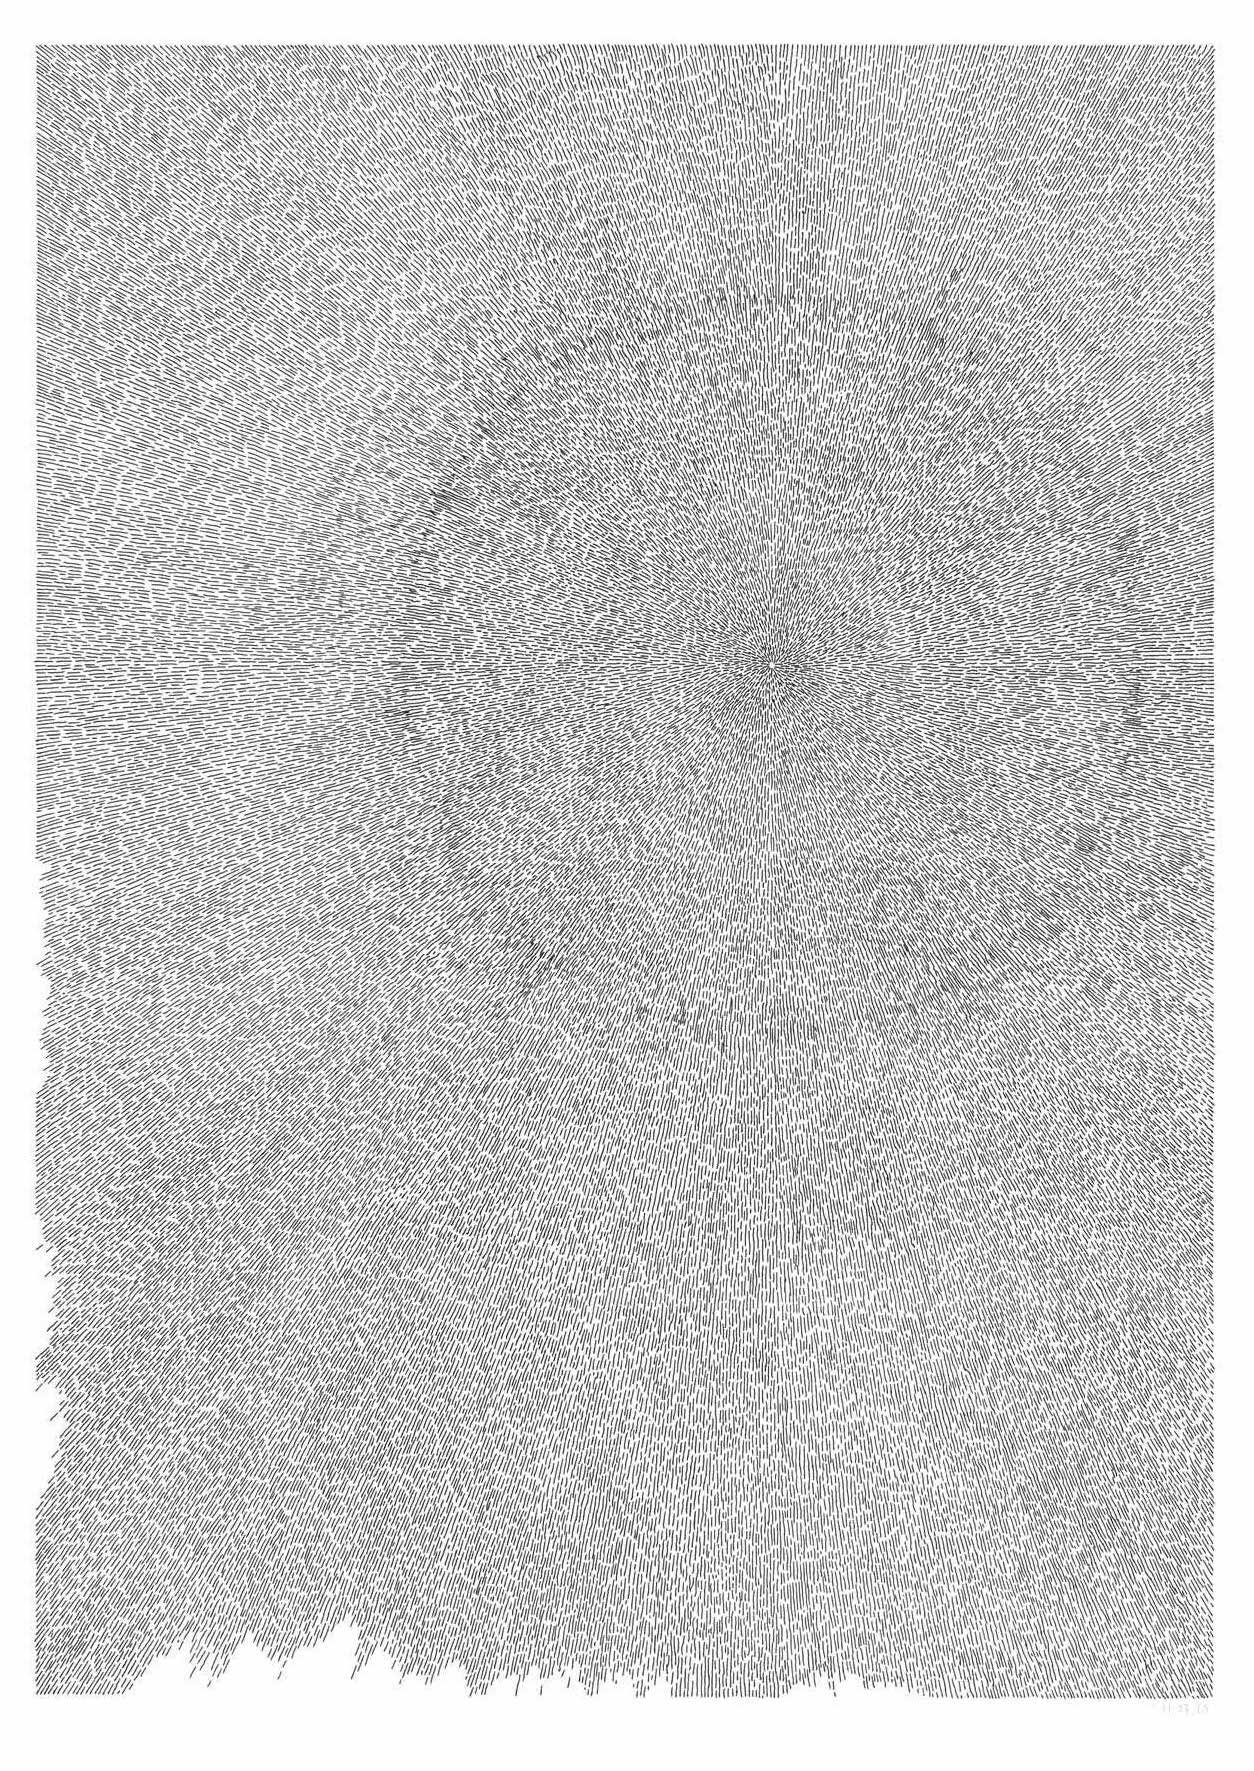 drawing 012_0_0.jpg